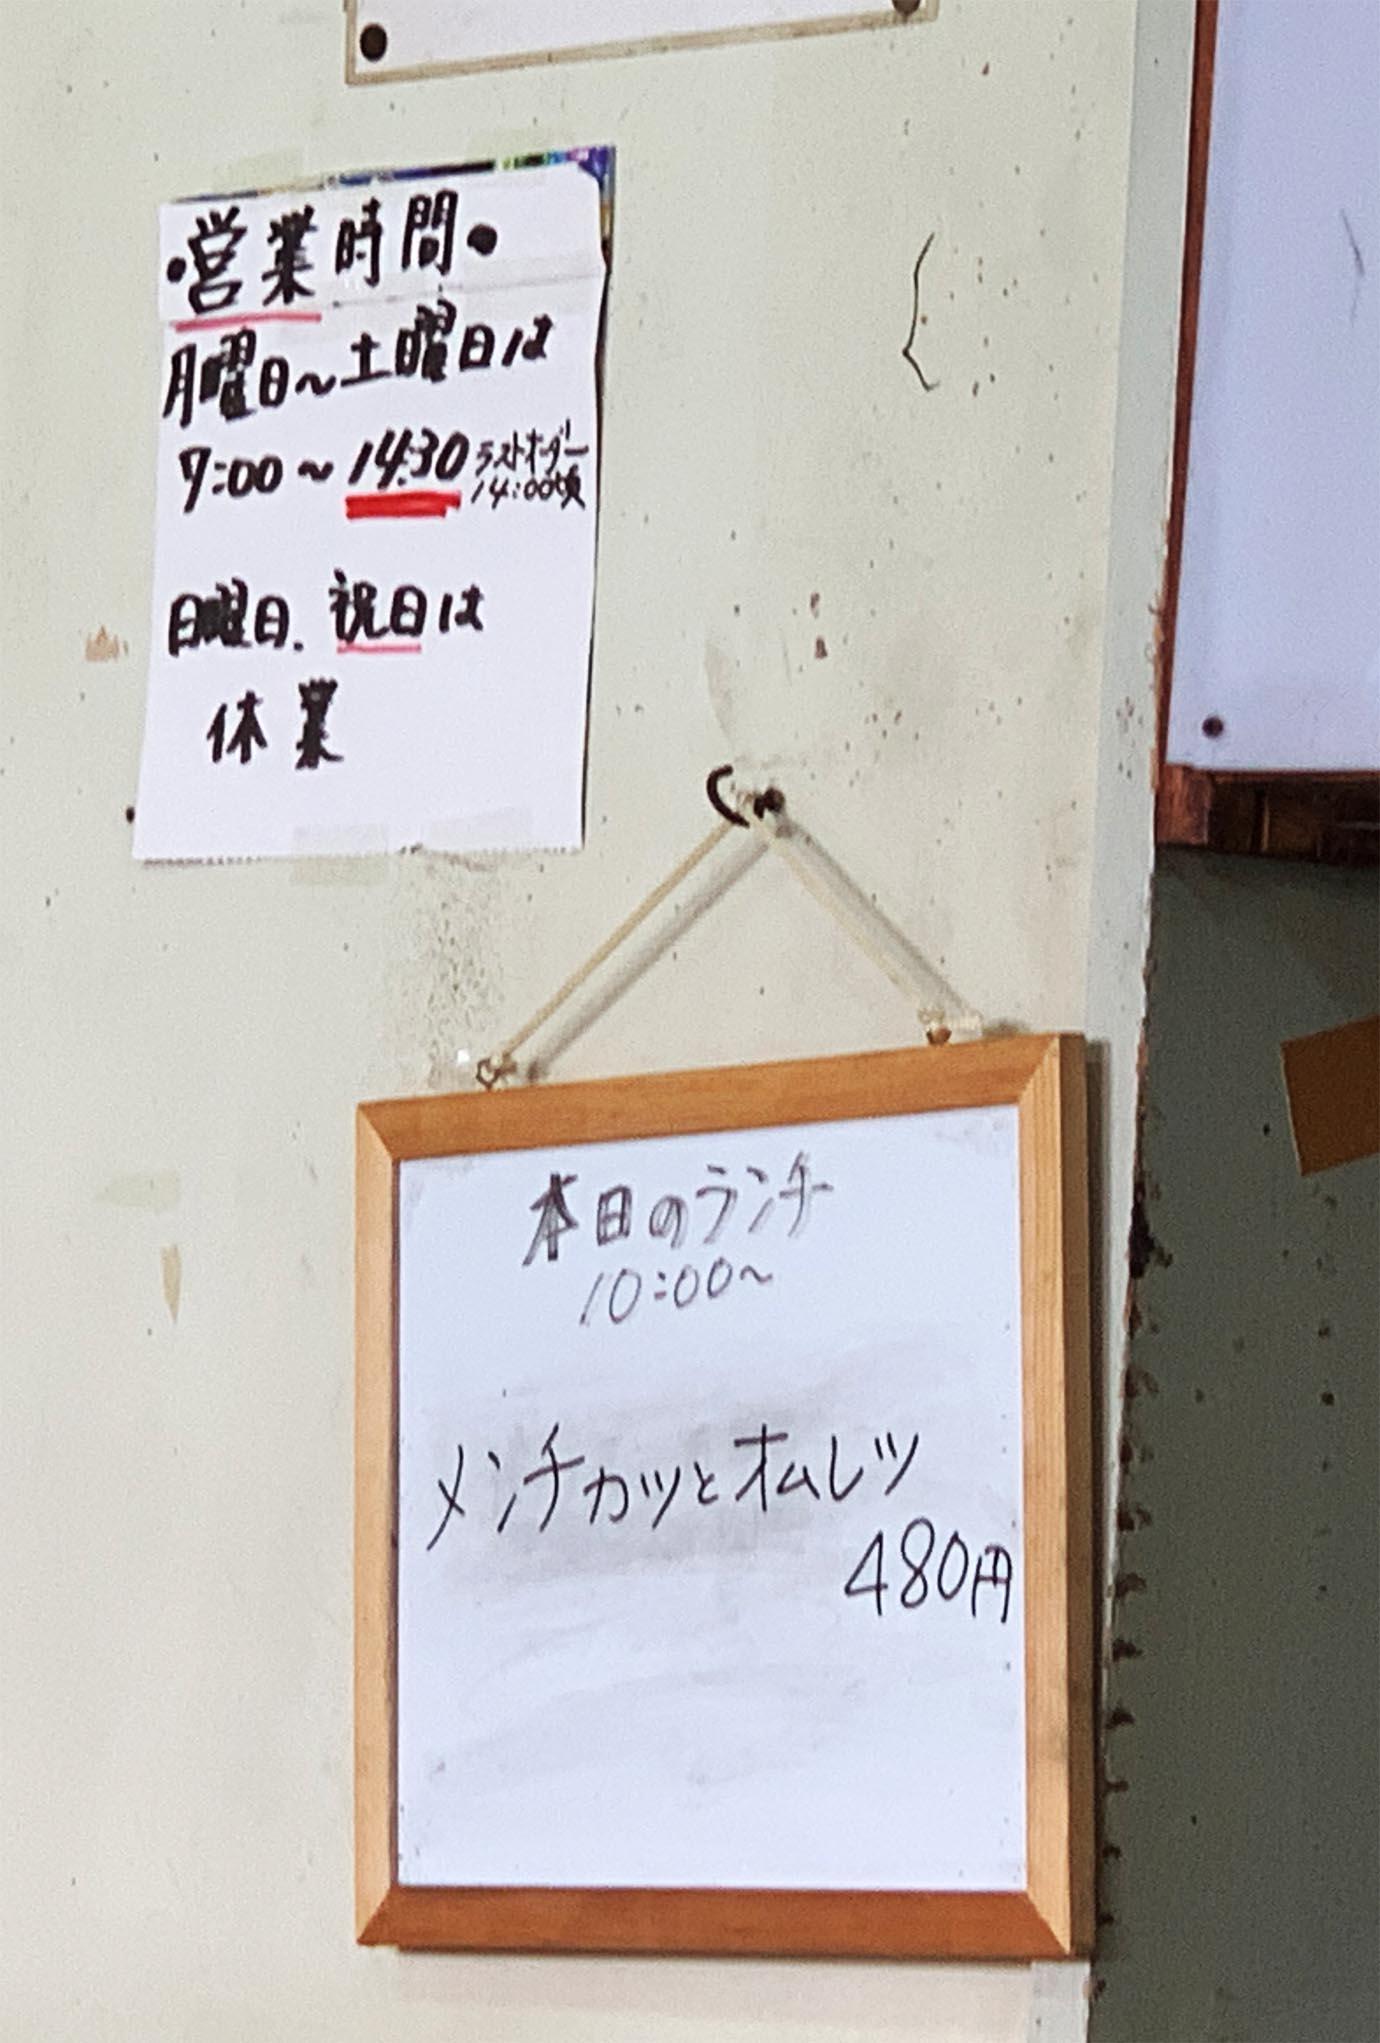 akita-bus-driver-cafeteria9